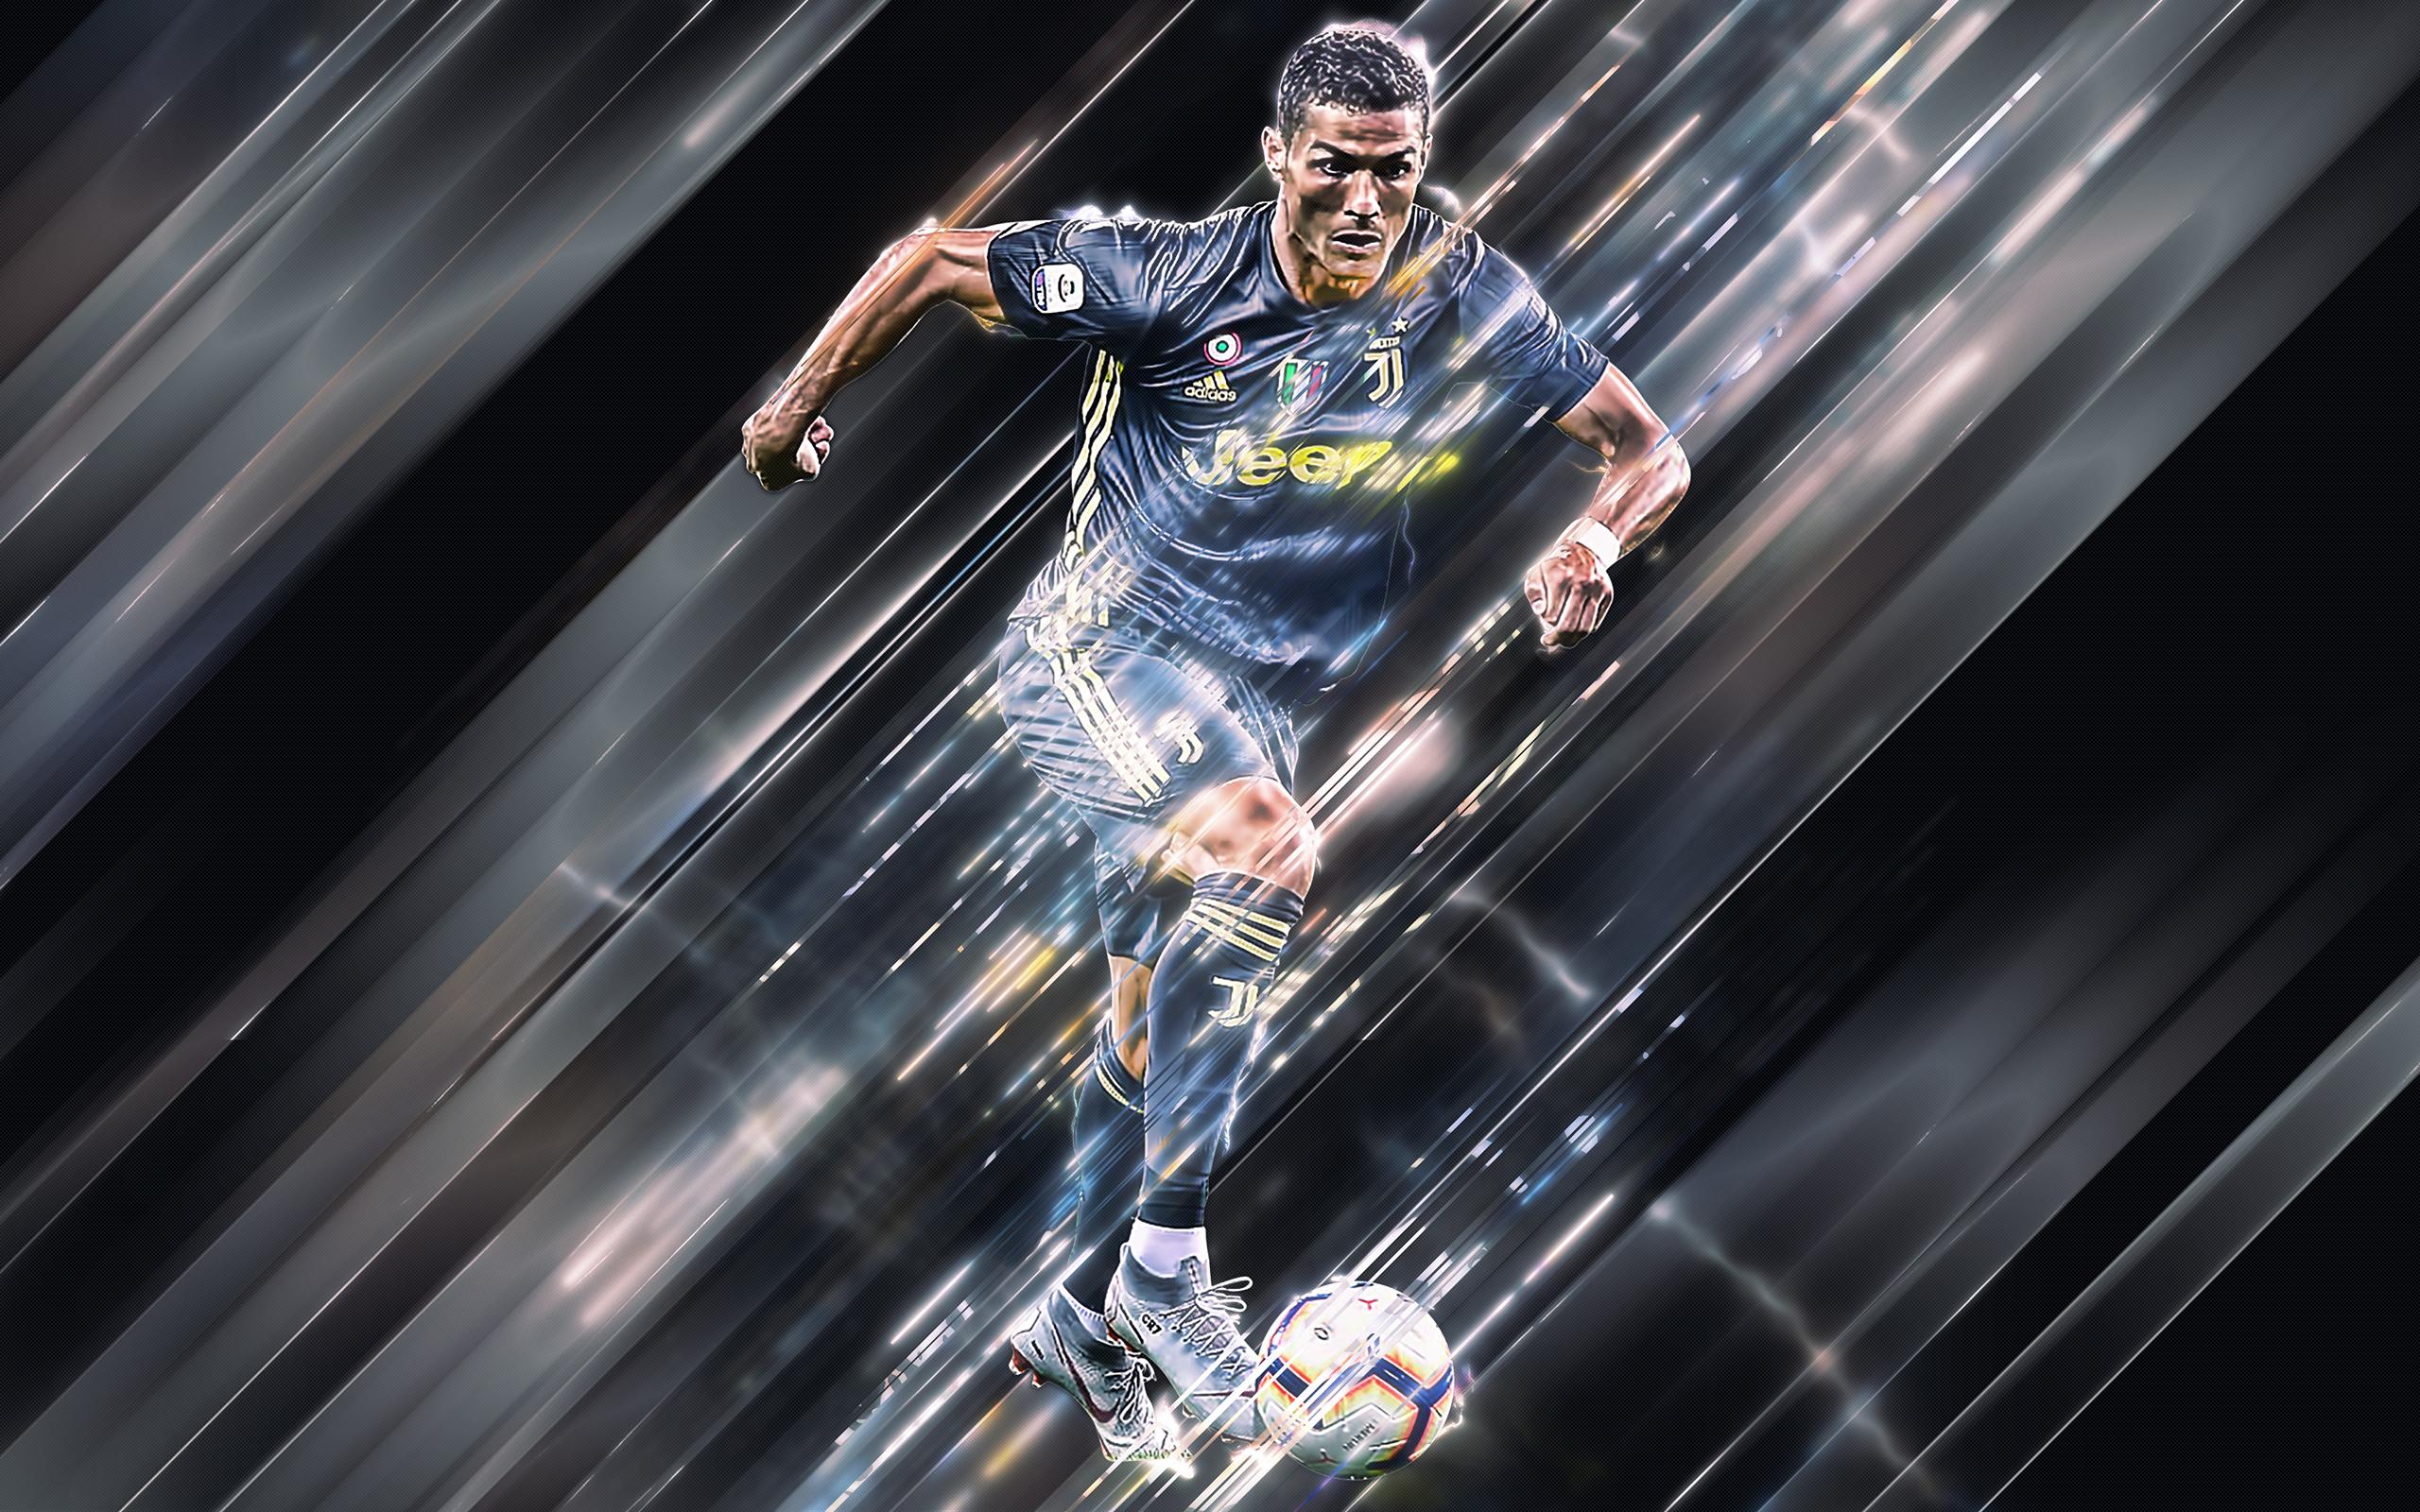 Cristiano Ronaldo Juventus Hd Wallpaper Background Image